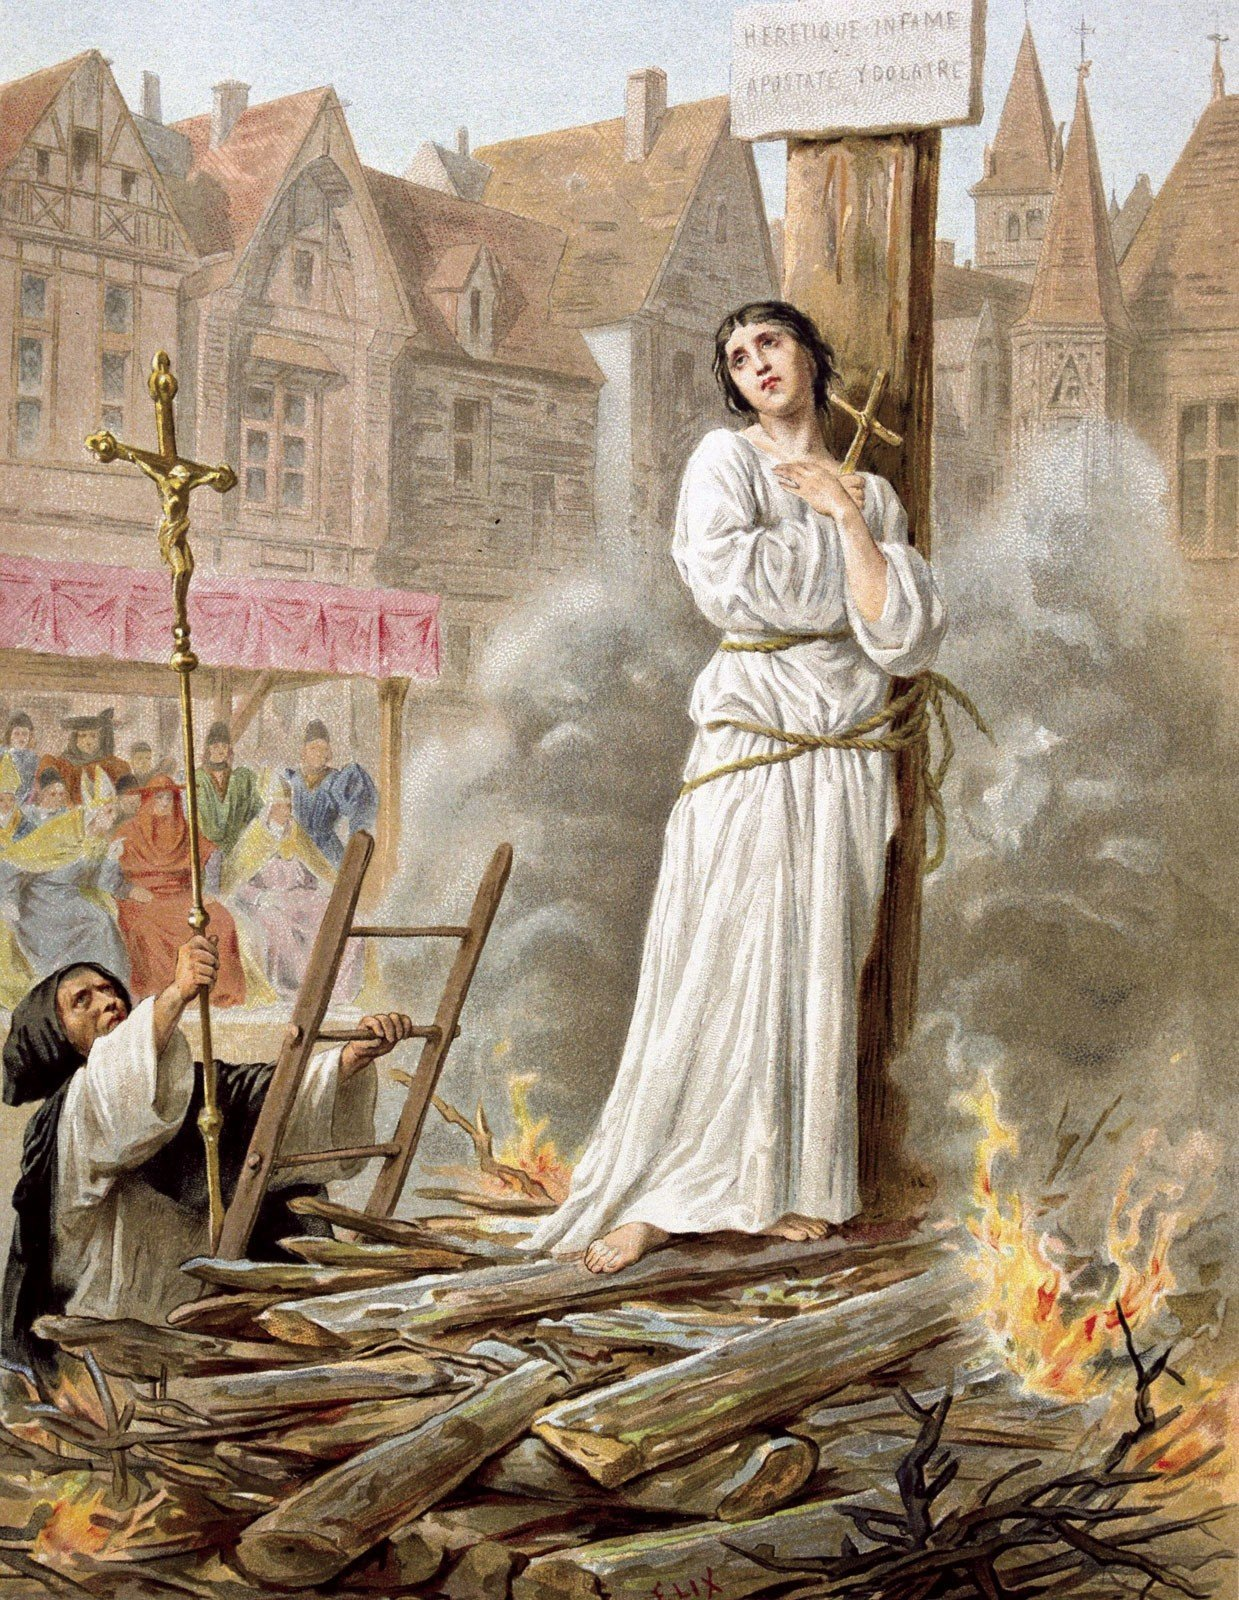 Joana d'Arc, heroína francesa e santa, foi queimada na fogueira